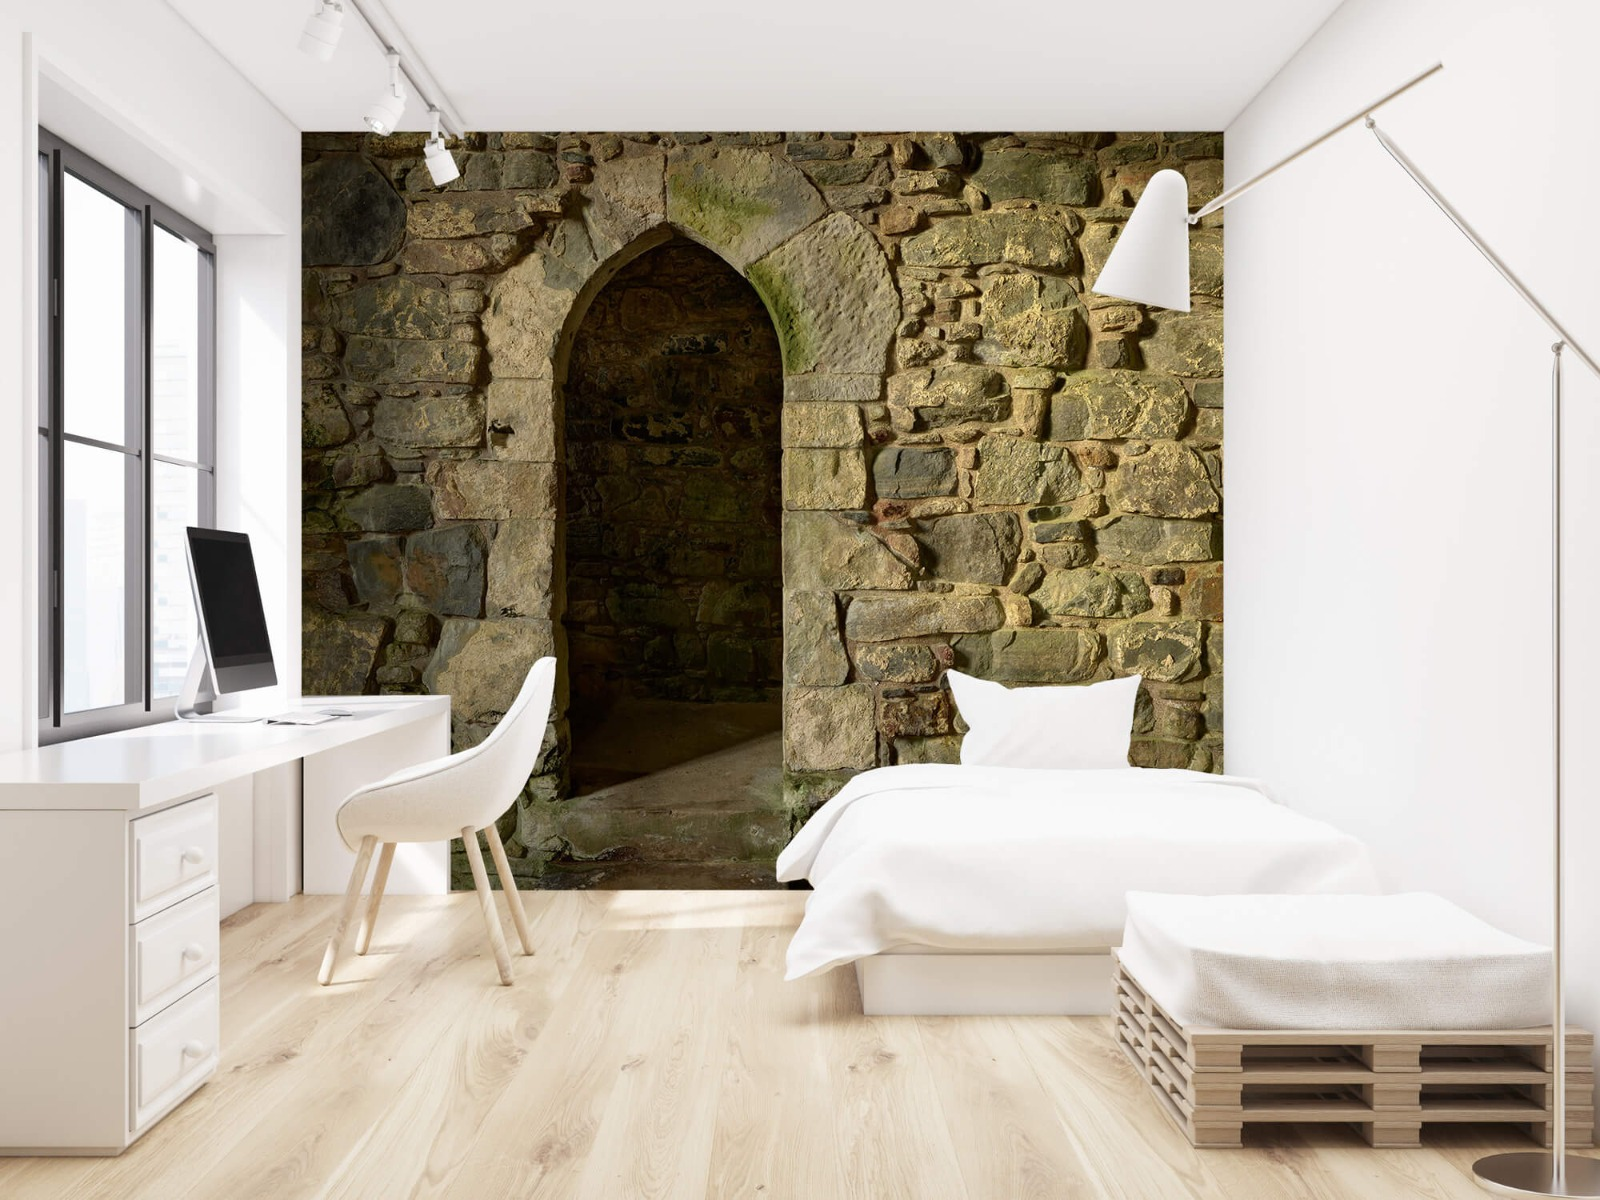 Steen behang - Oude muur met doorgang - Slaapkamer 22